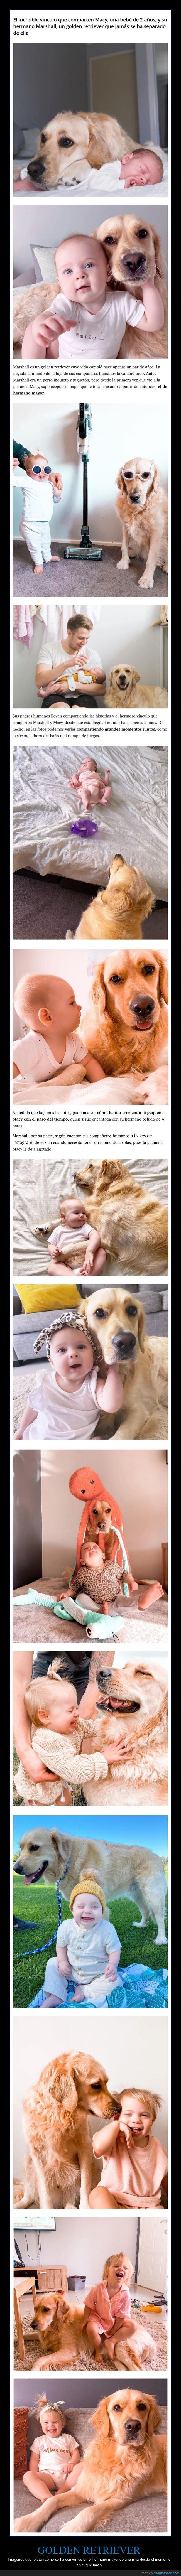 hermano mayor,niña,perro